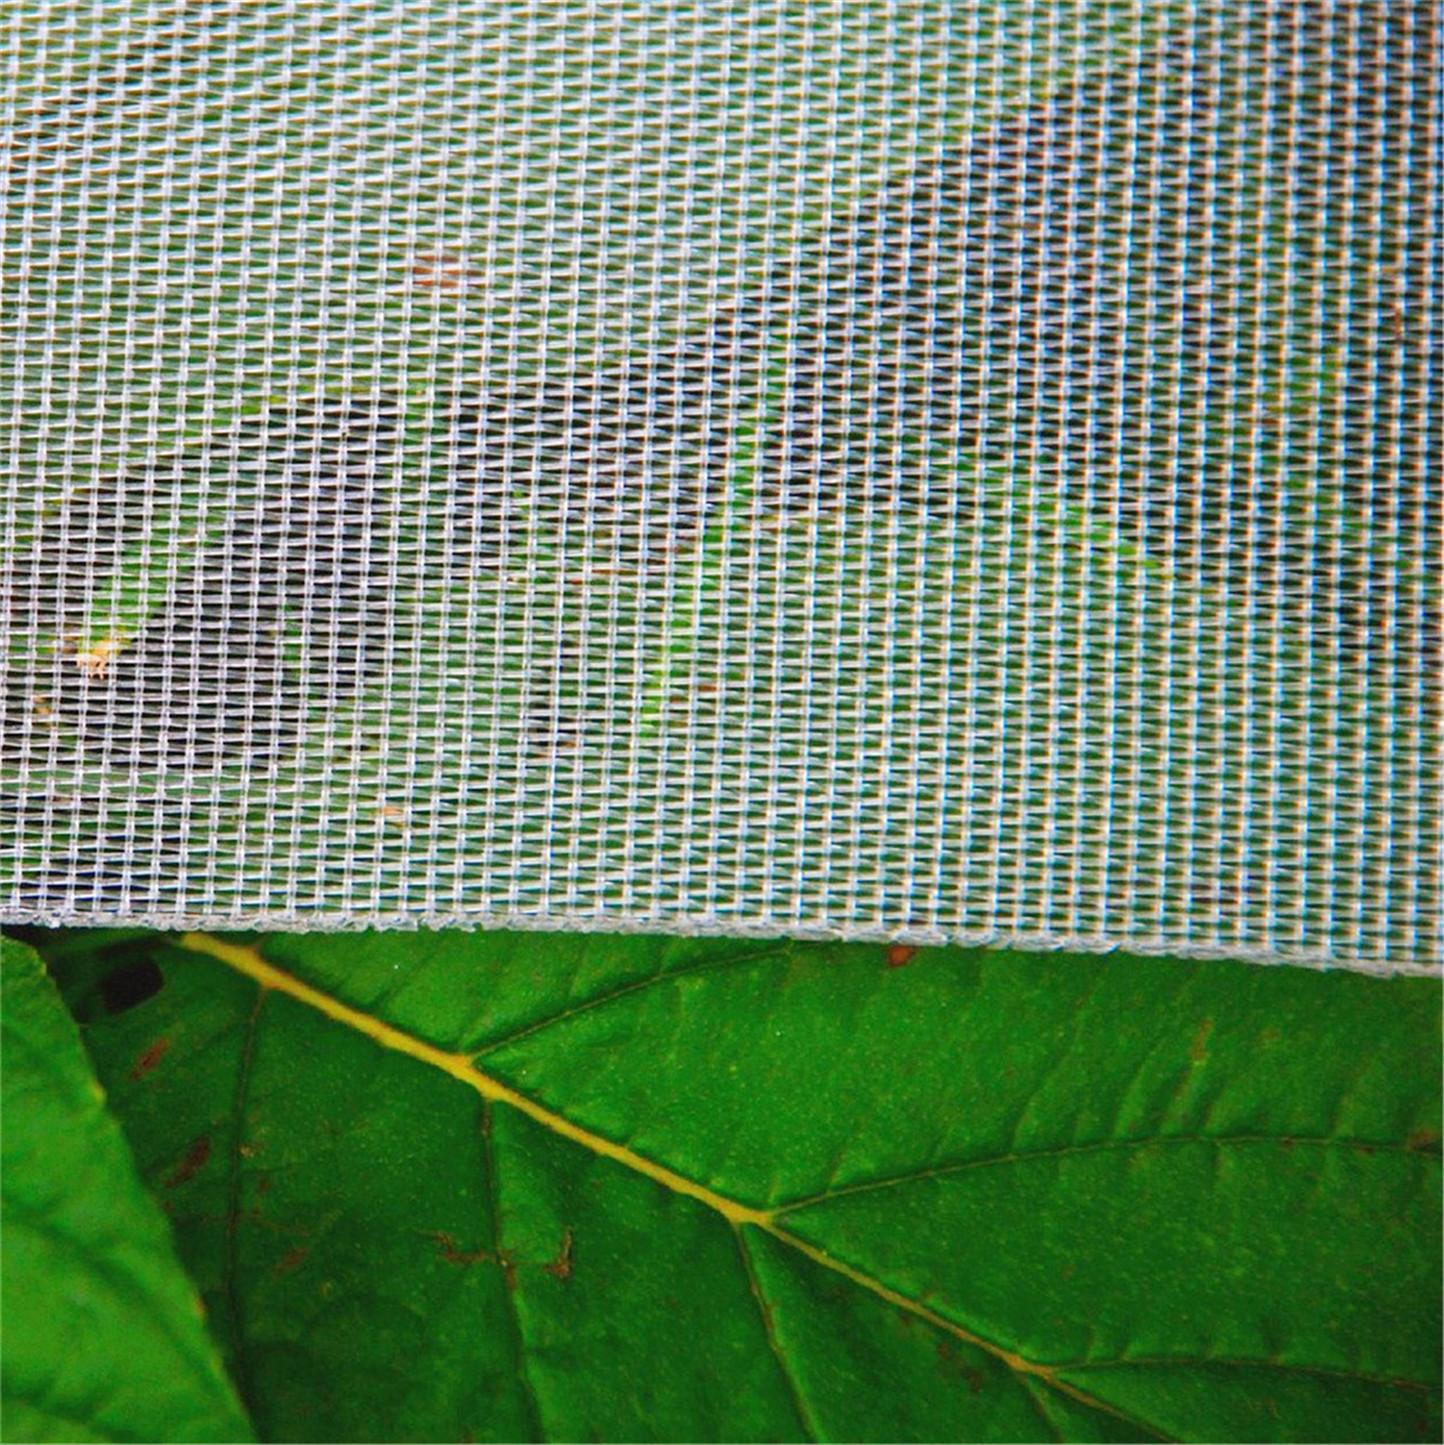 Home Horta Hortaliças Horta Horta Pomar Anti-pássaros Rede anti-inseto